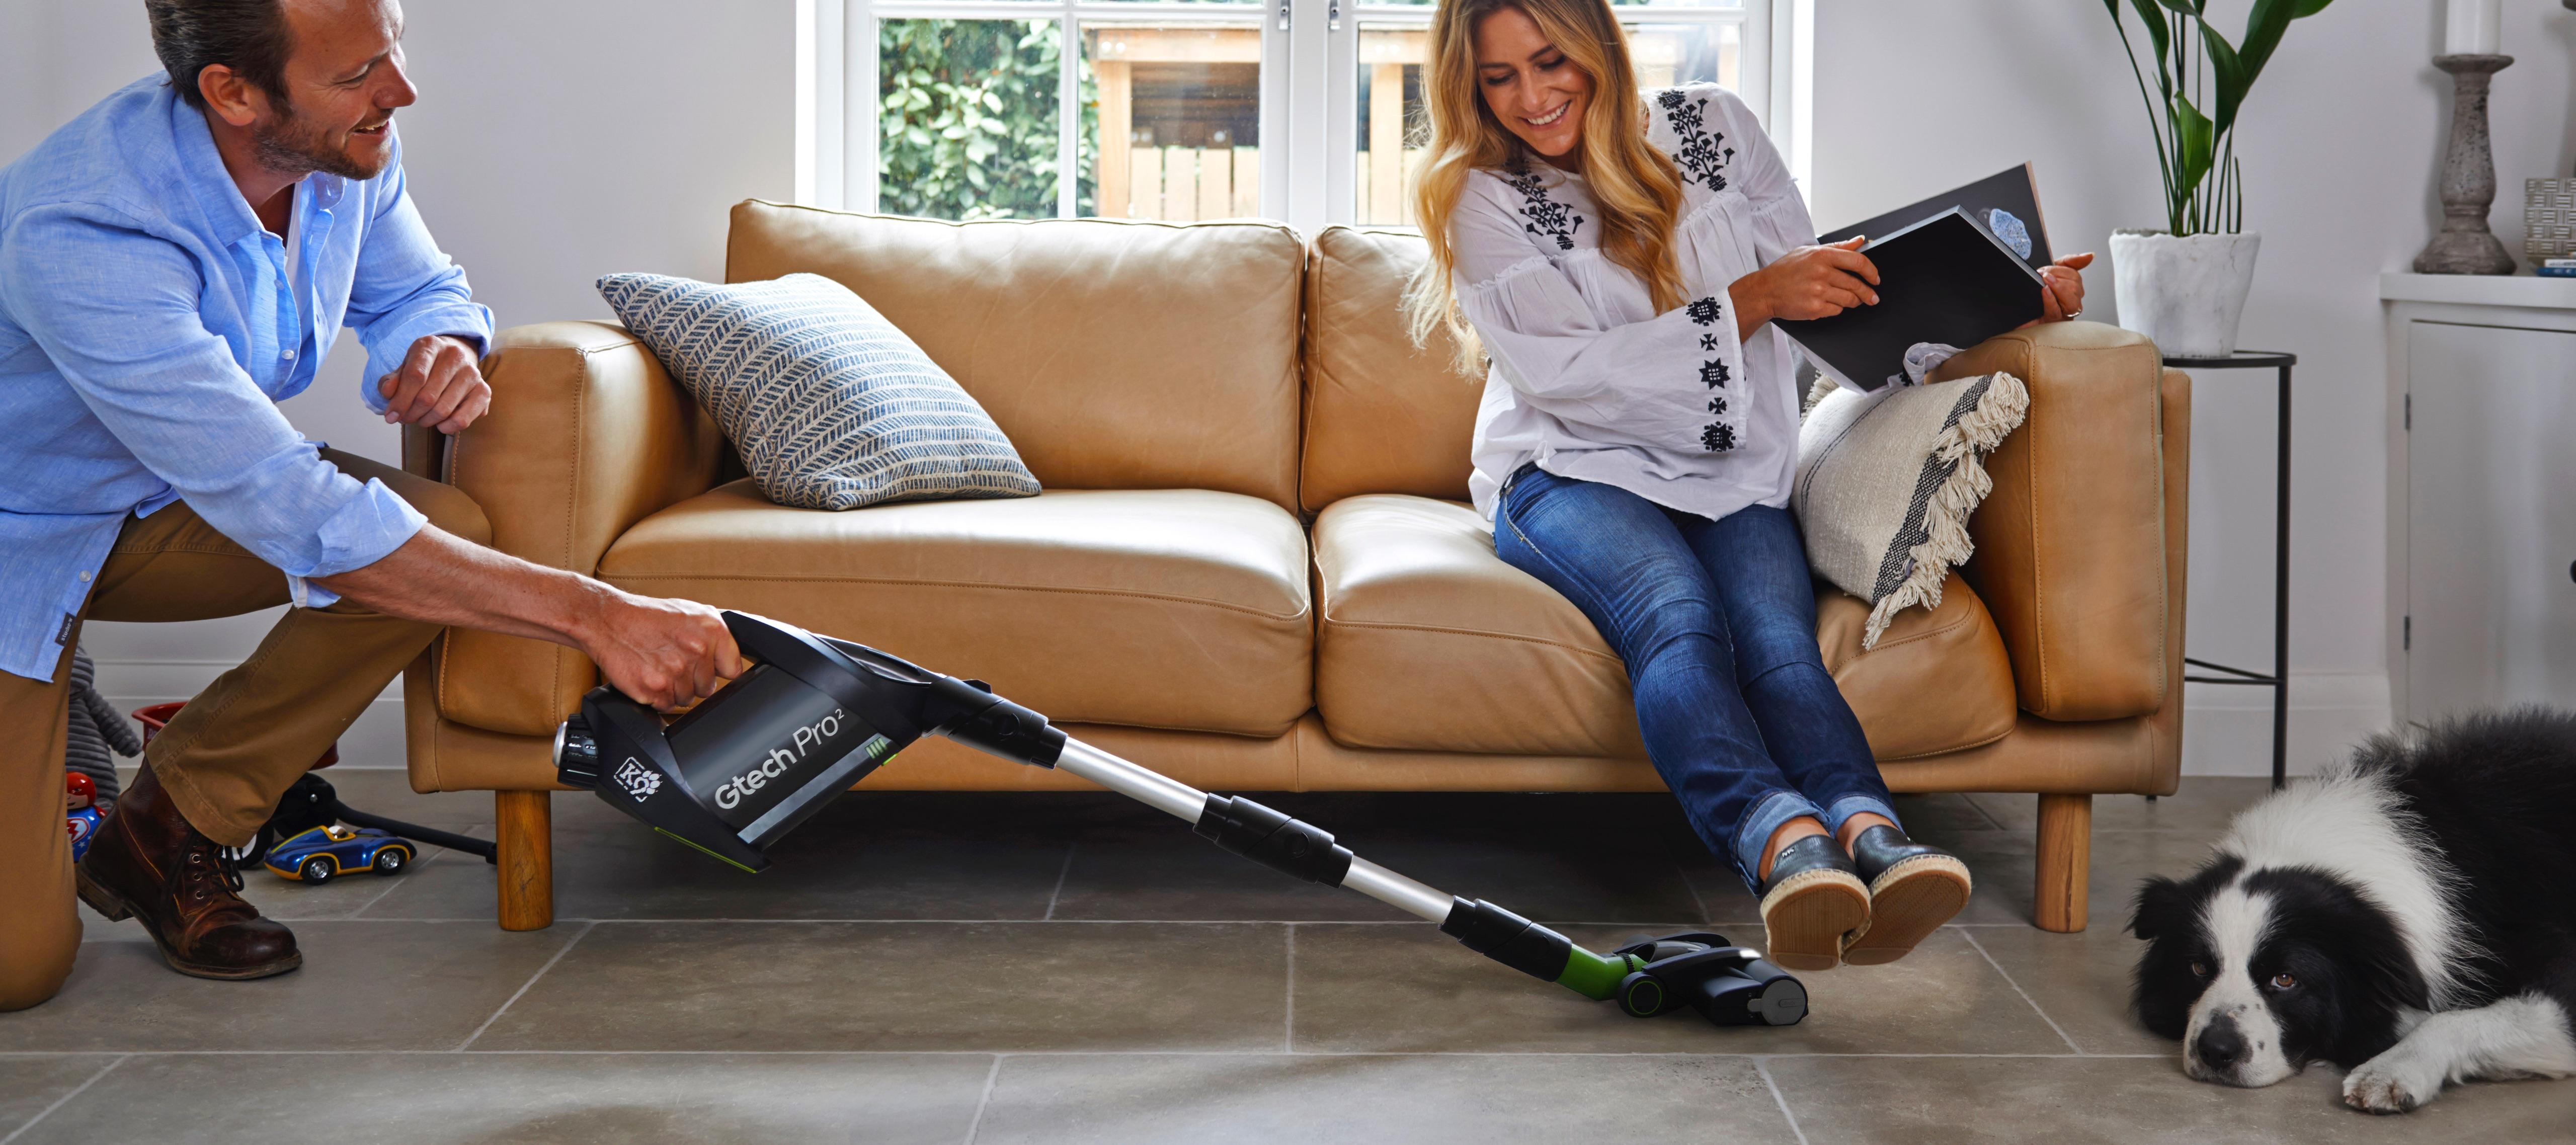 Pro 2 K9 cordless stick pet vacuum cleaner